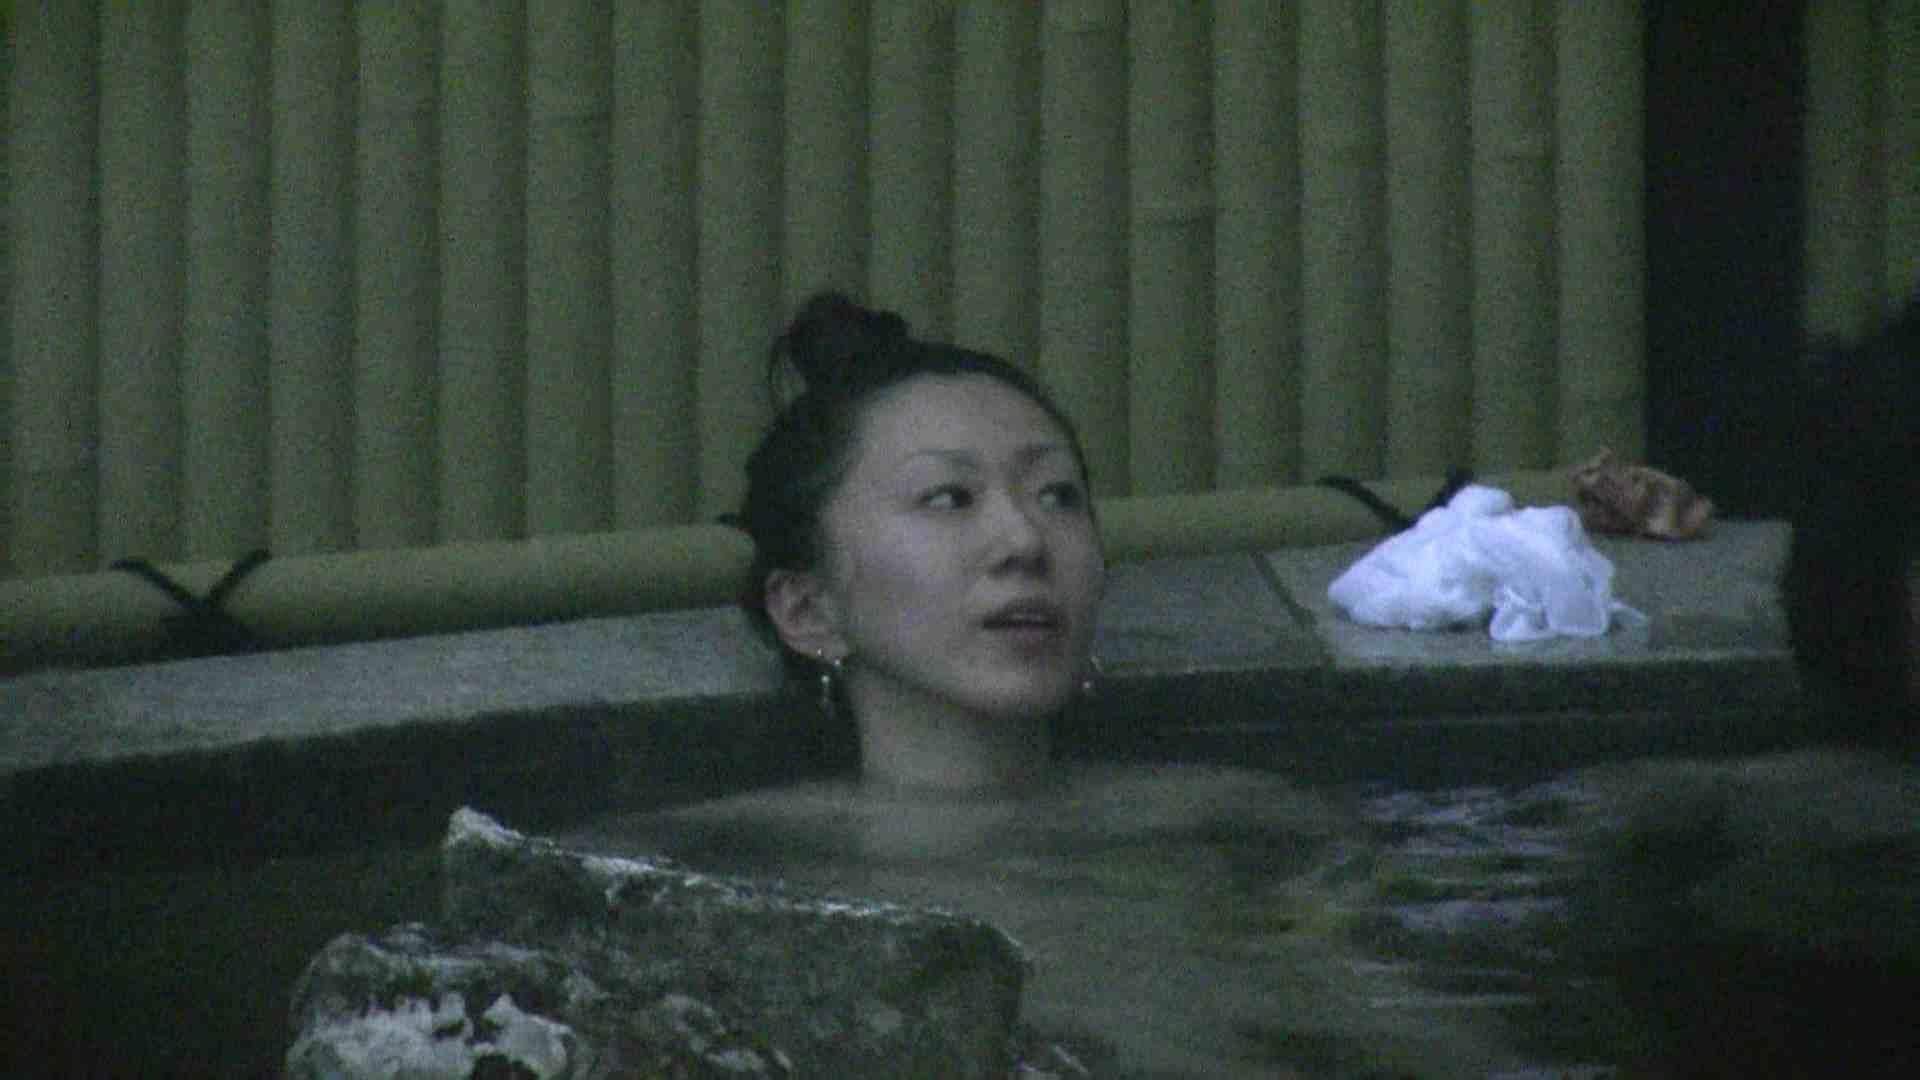 Aquaな露天風呂Vol.587 盗撮  29連発 15